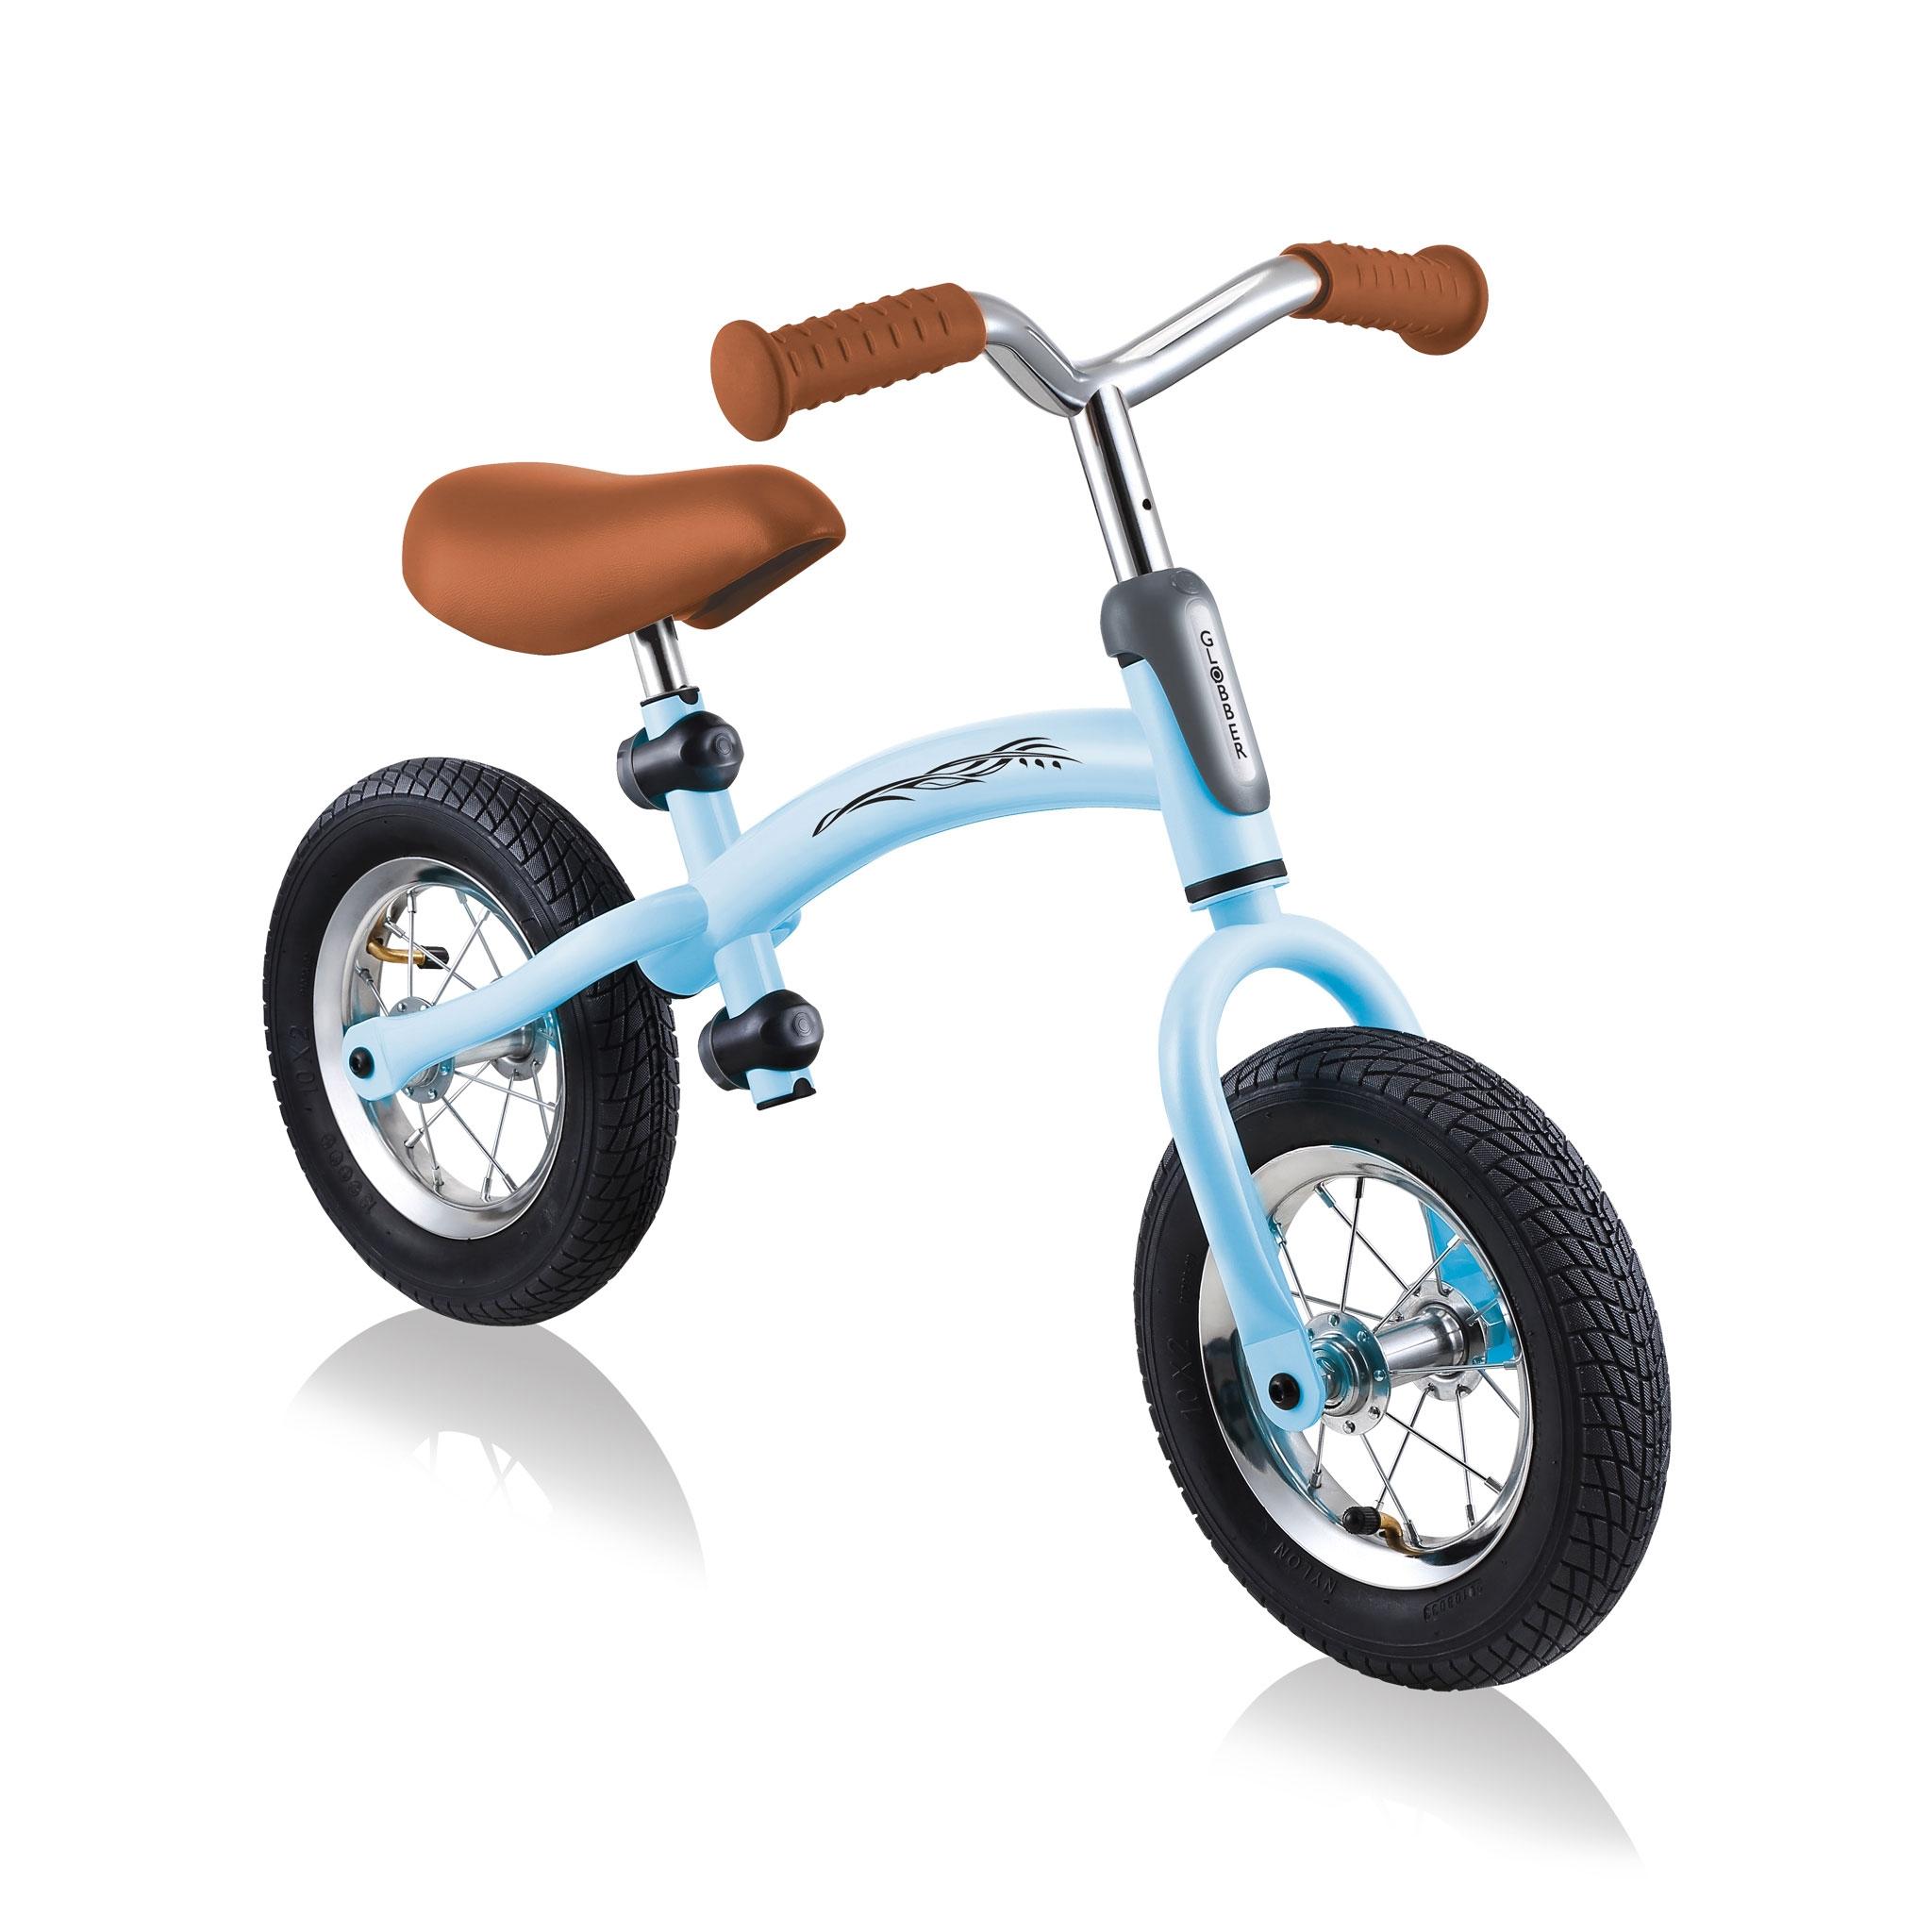 GO-BIKE-AIR-best-toddler-balance-bike-for-kids-aged-3-to-6_pastel-blue 1